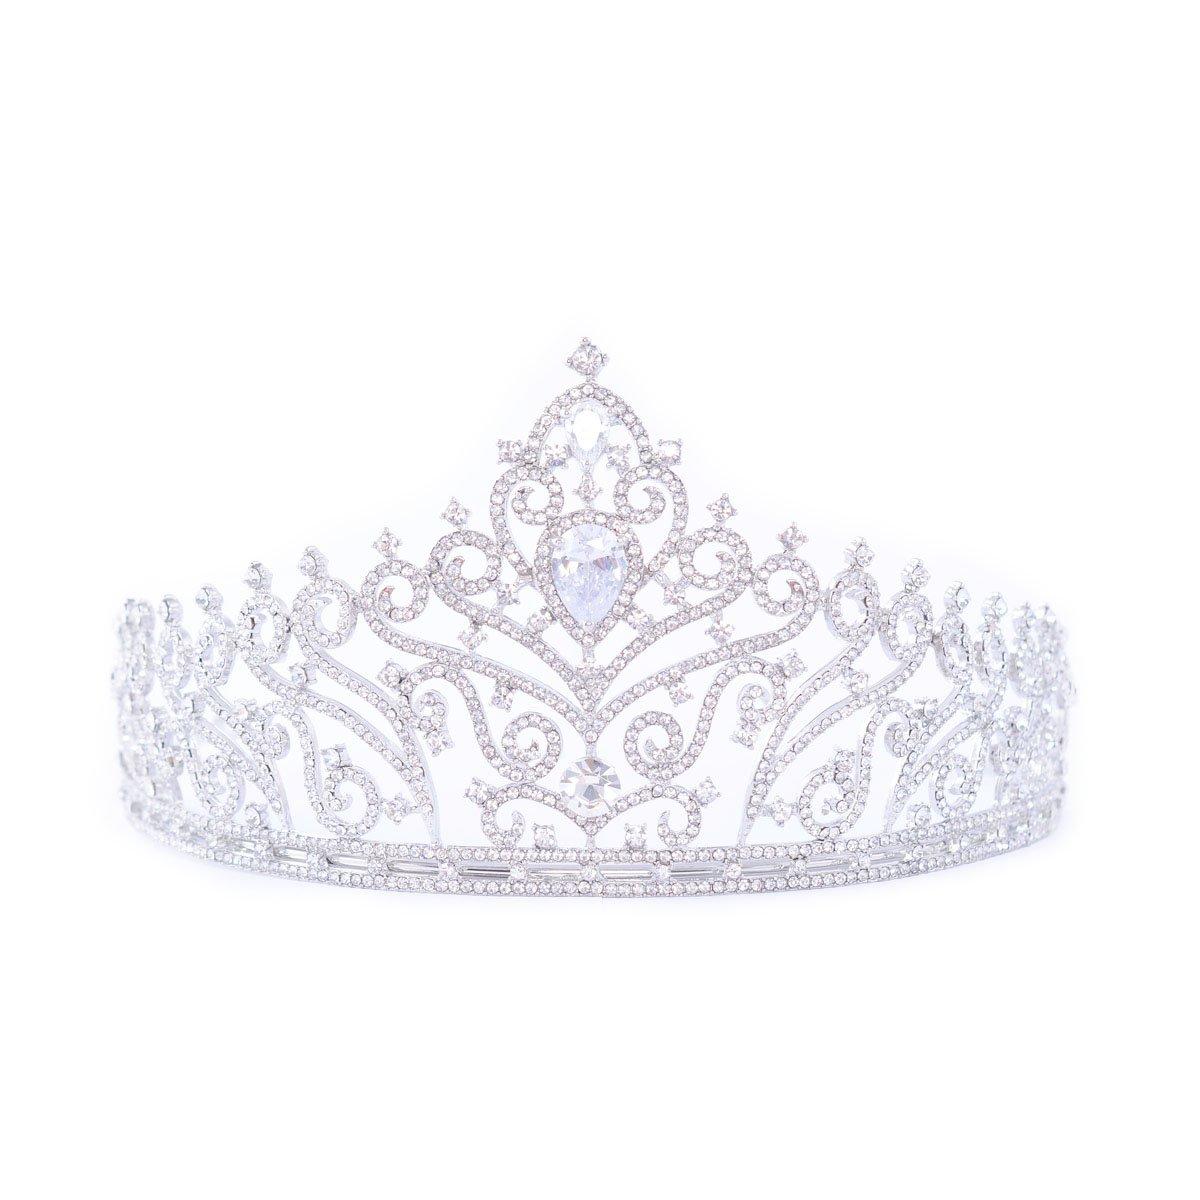 FF Rhinestone Crystal Tiara for Bride Dress-up Crown